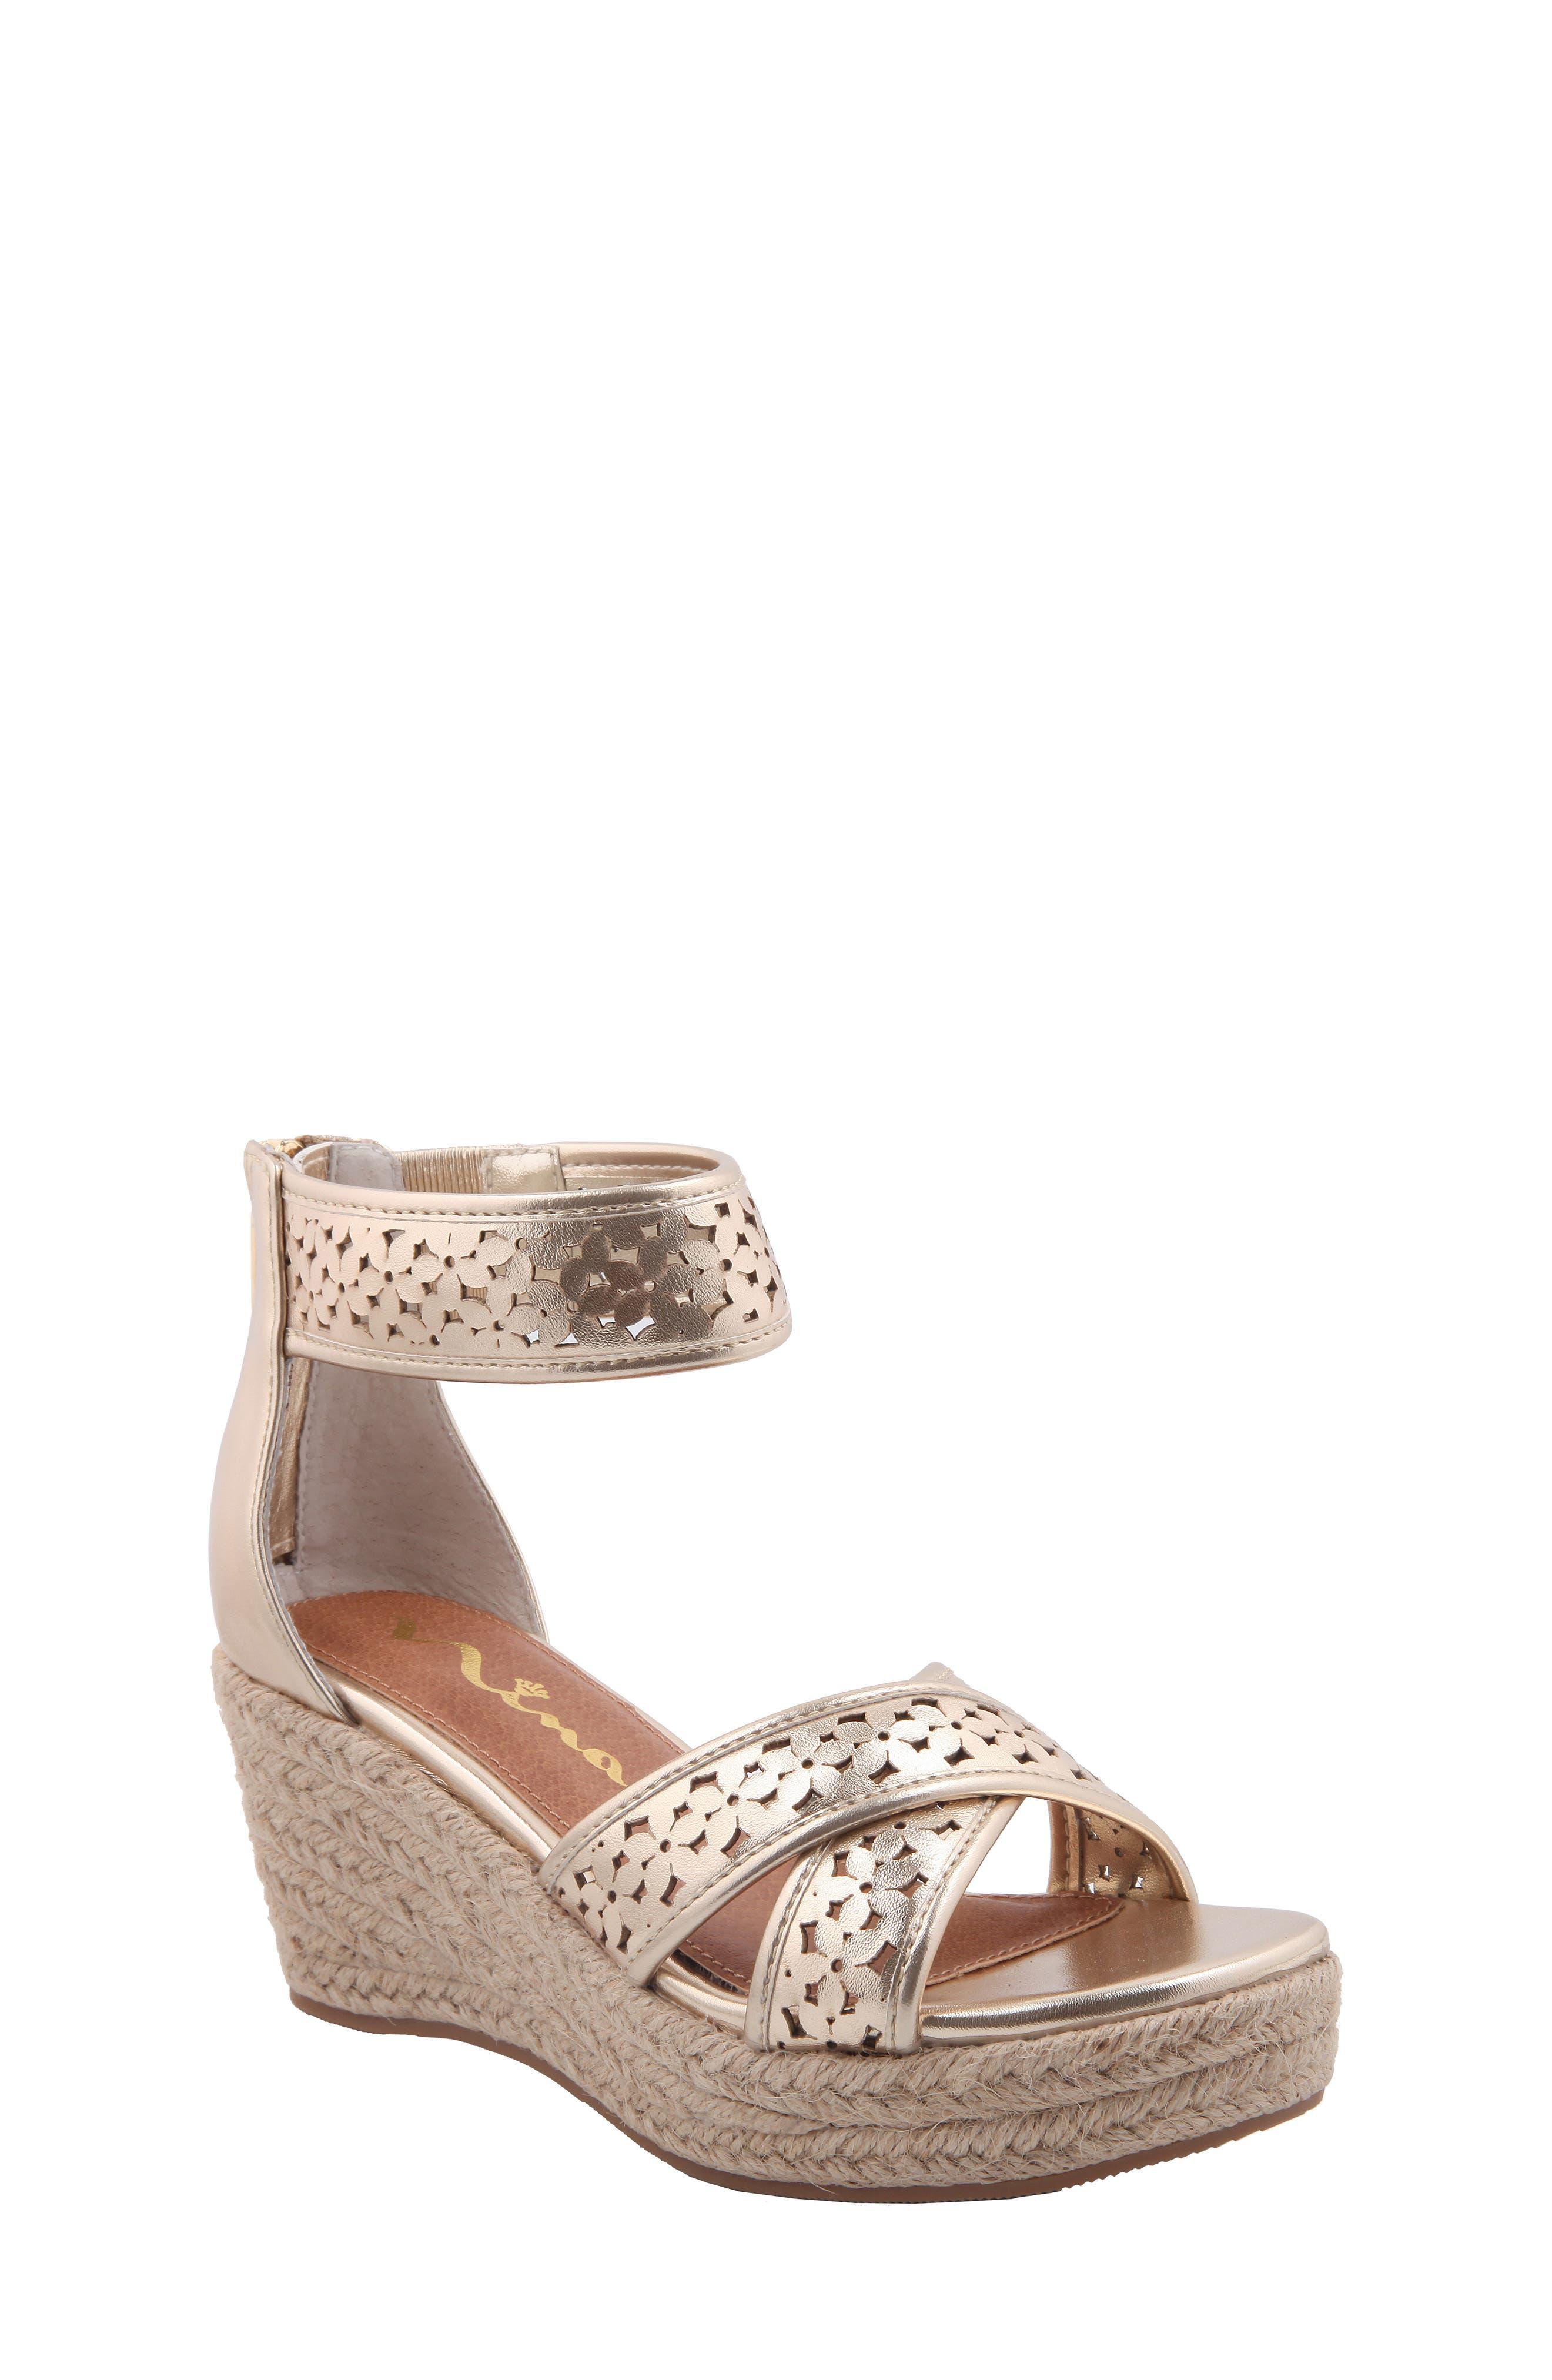 NINA Chicory Perforated Platform Sandal